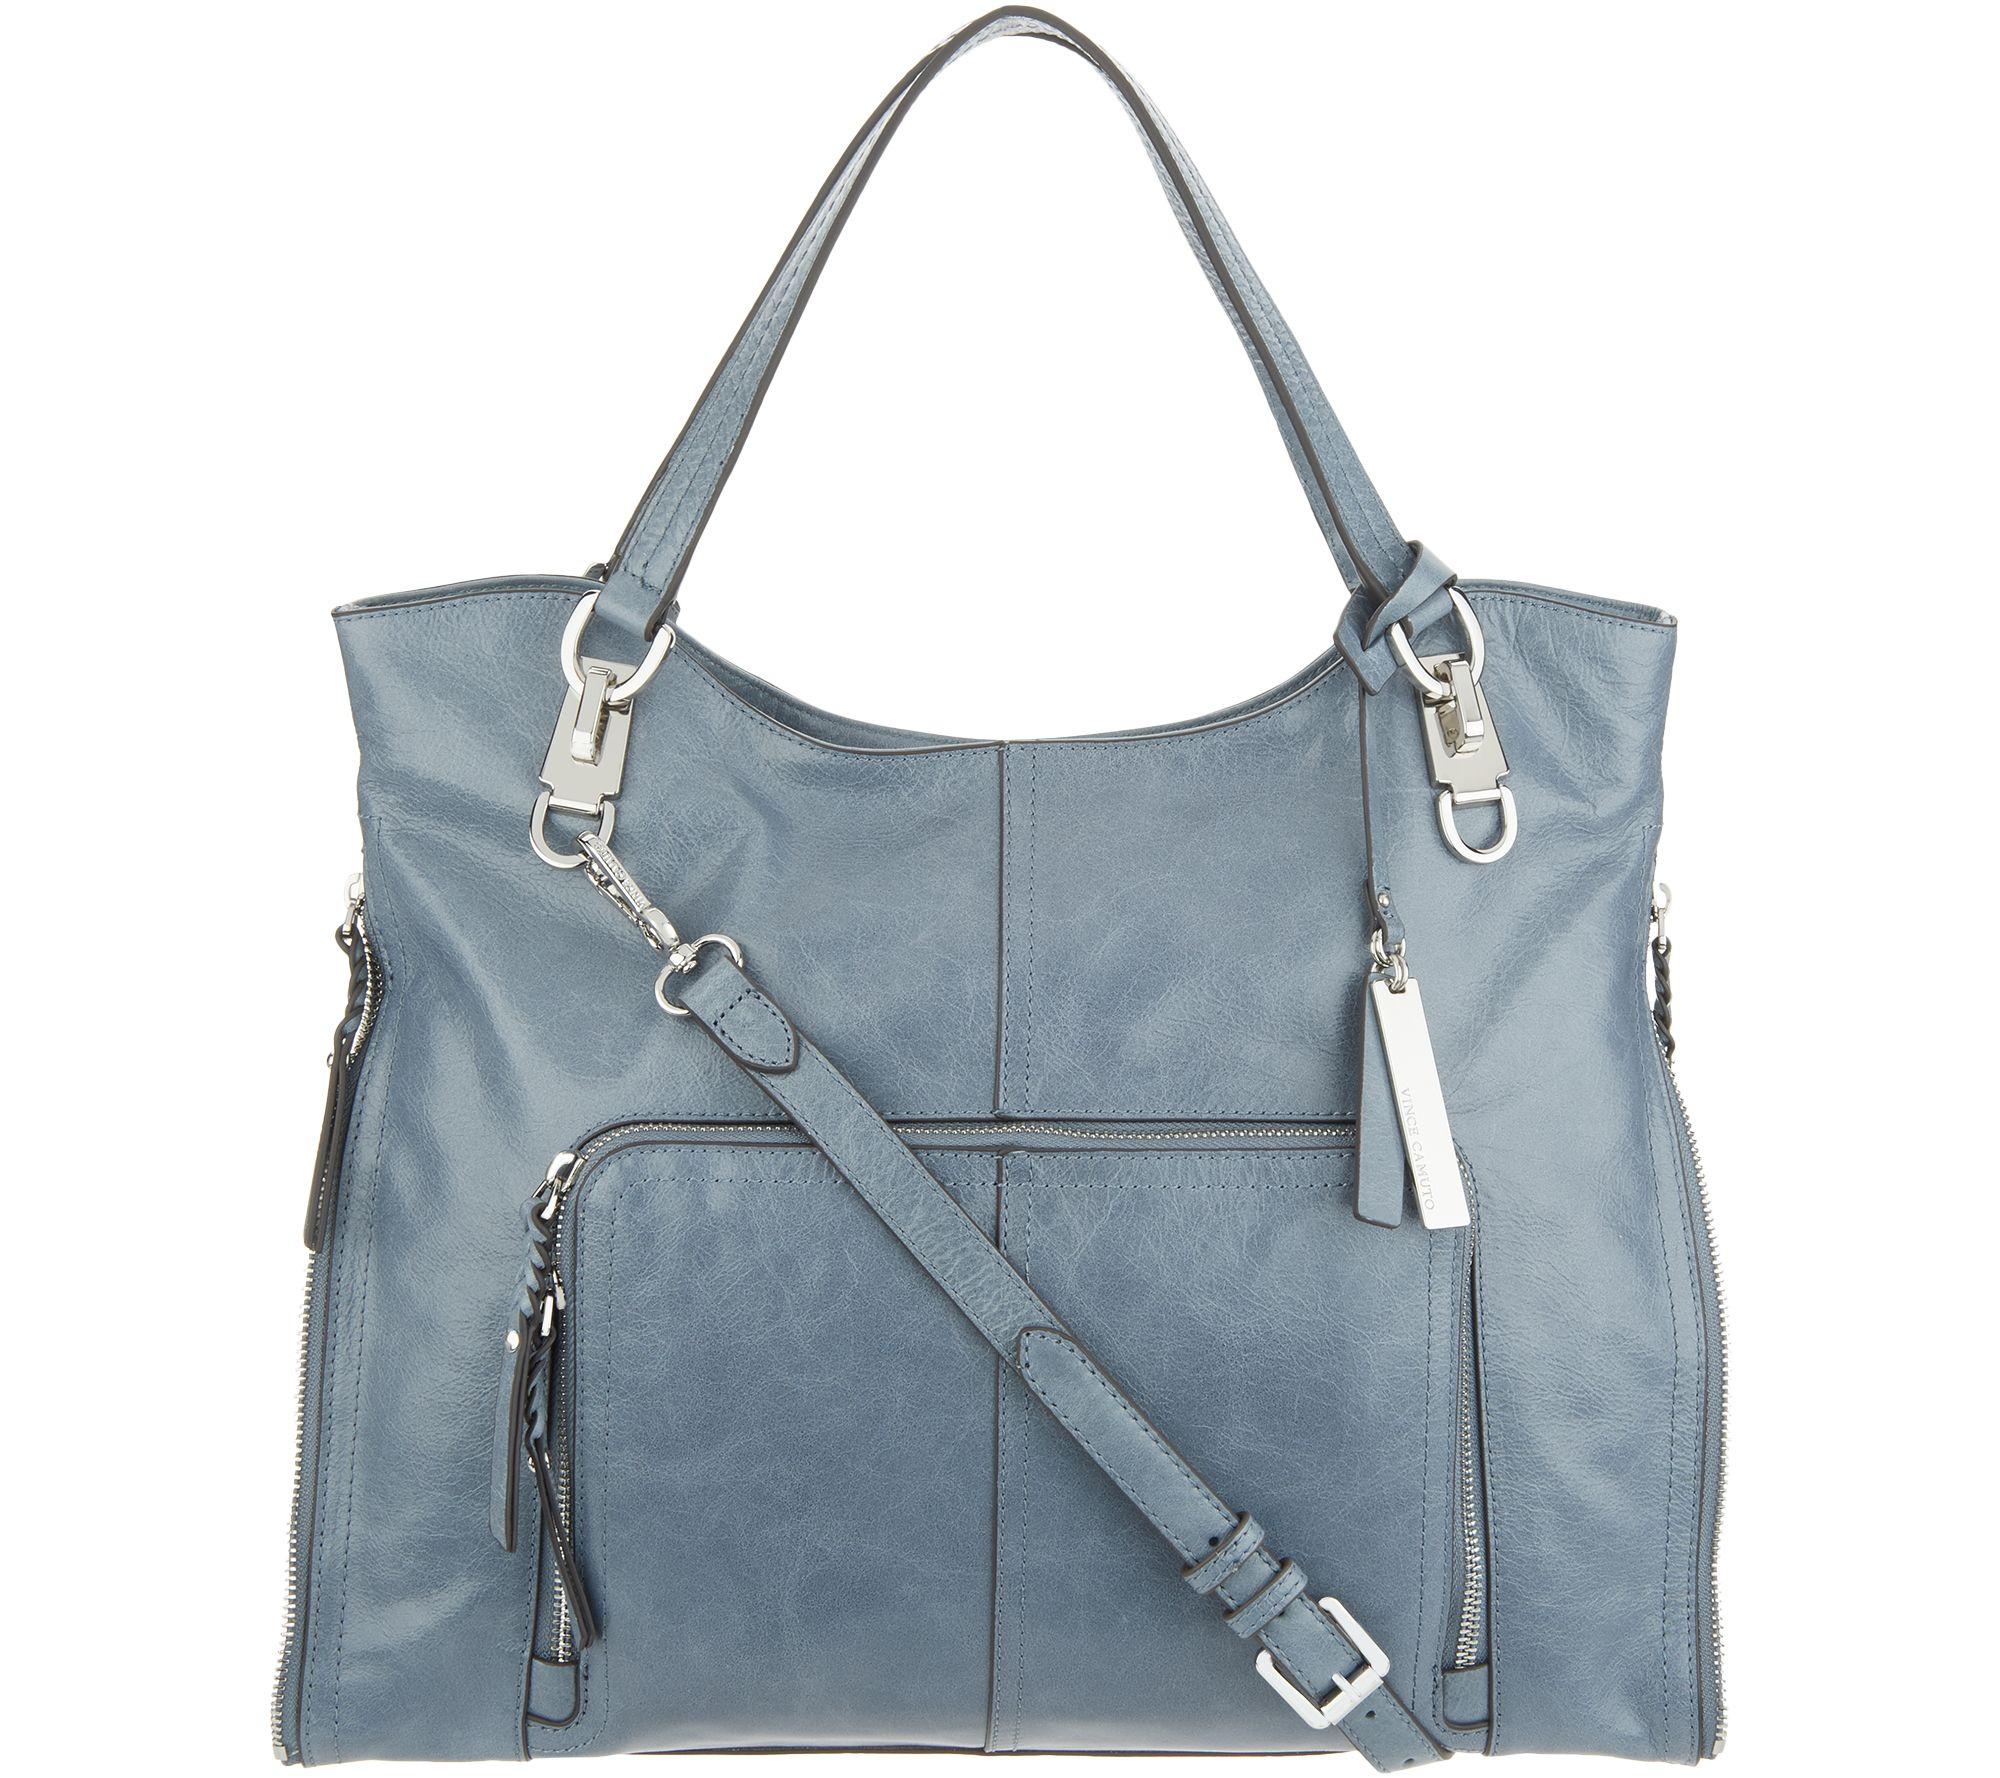 e080e012196 Vince Camuto Leather Tote Bag - Narra - Page 1 — QVC.com